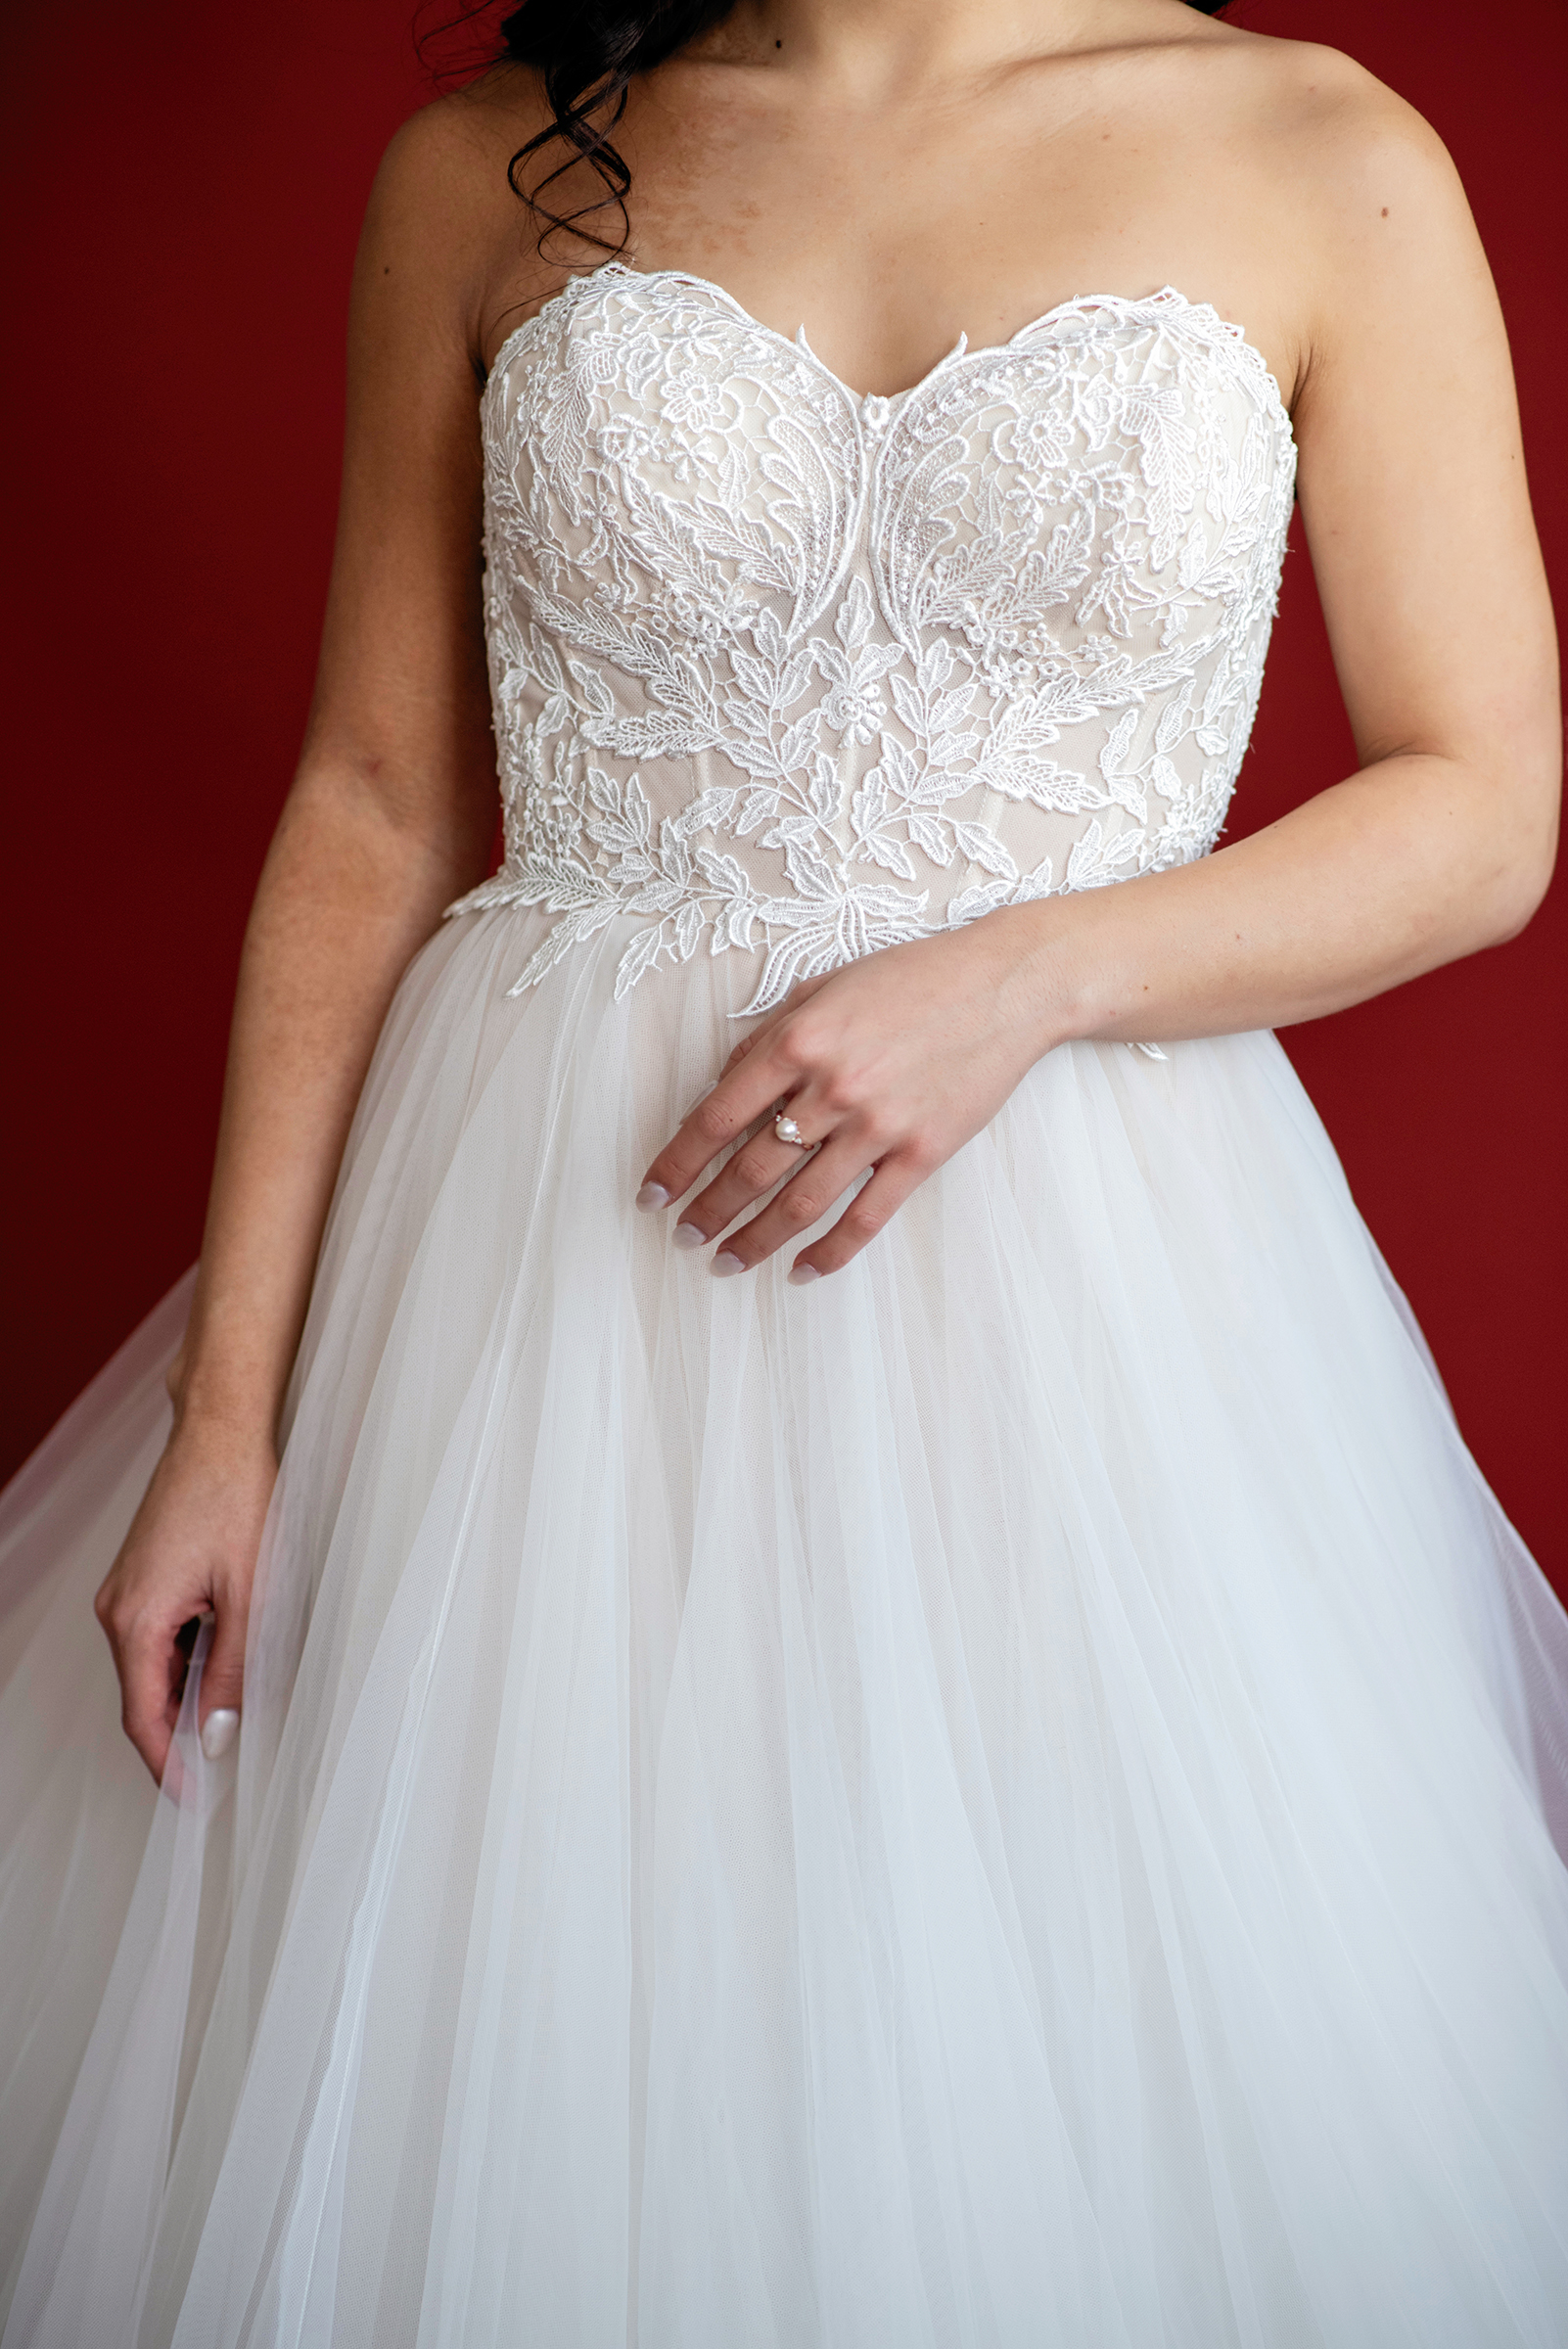 Stephanie-Fourth Dress Details-1.jpg